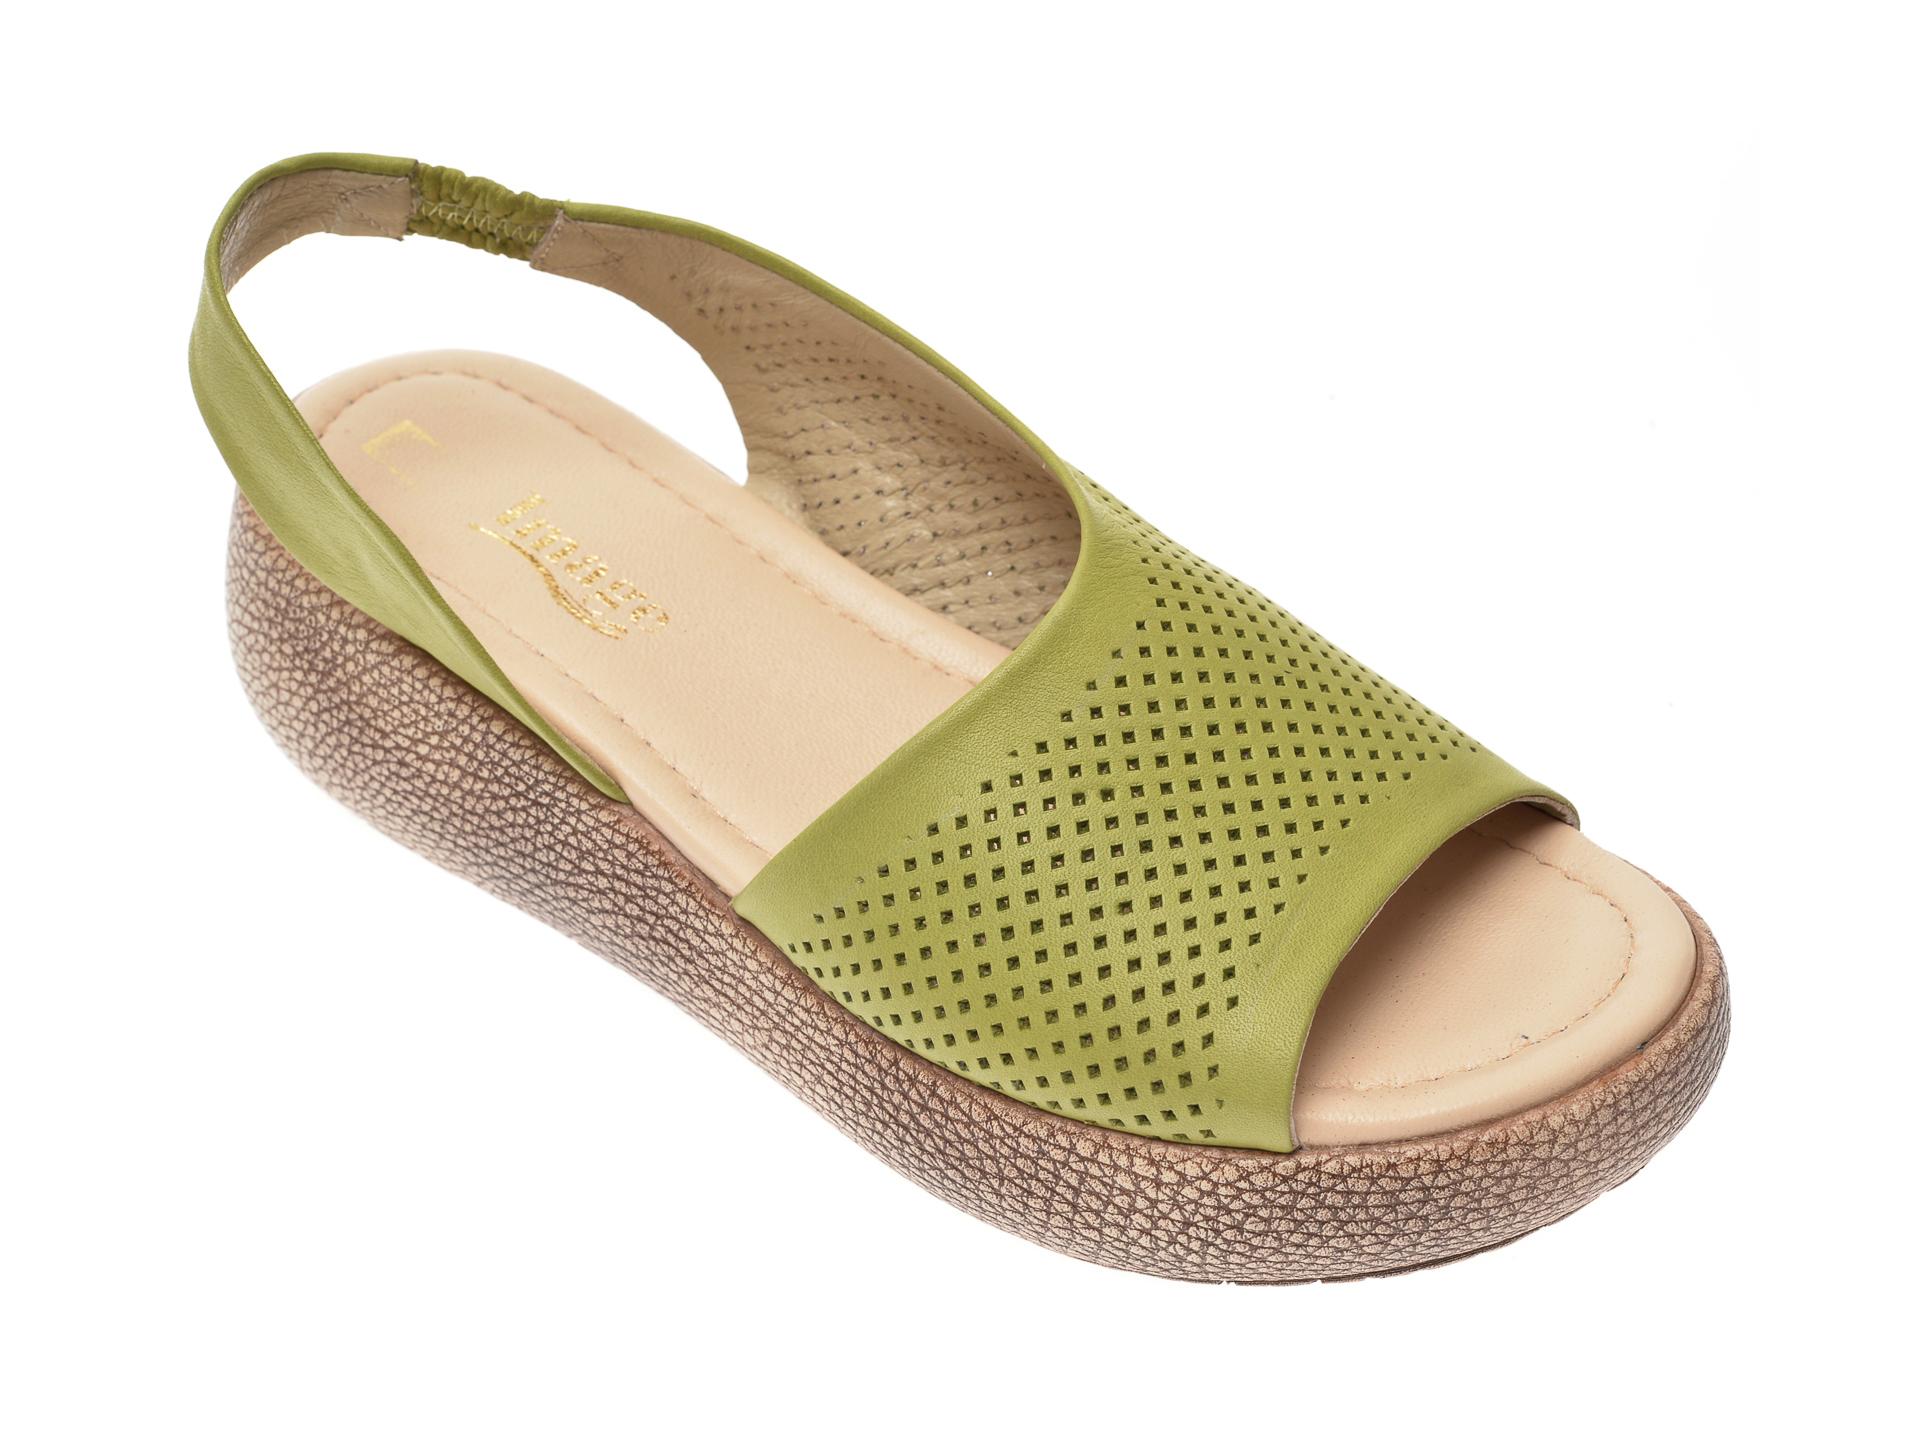 Sandale IMAGE verzi, 6033, din piele naturala